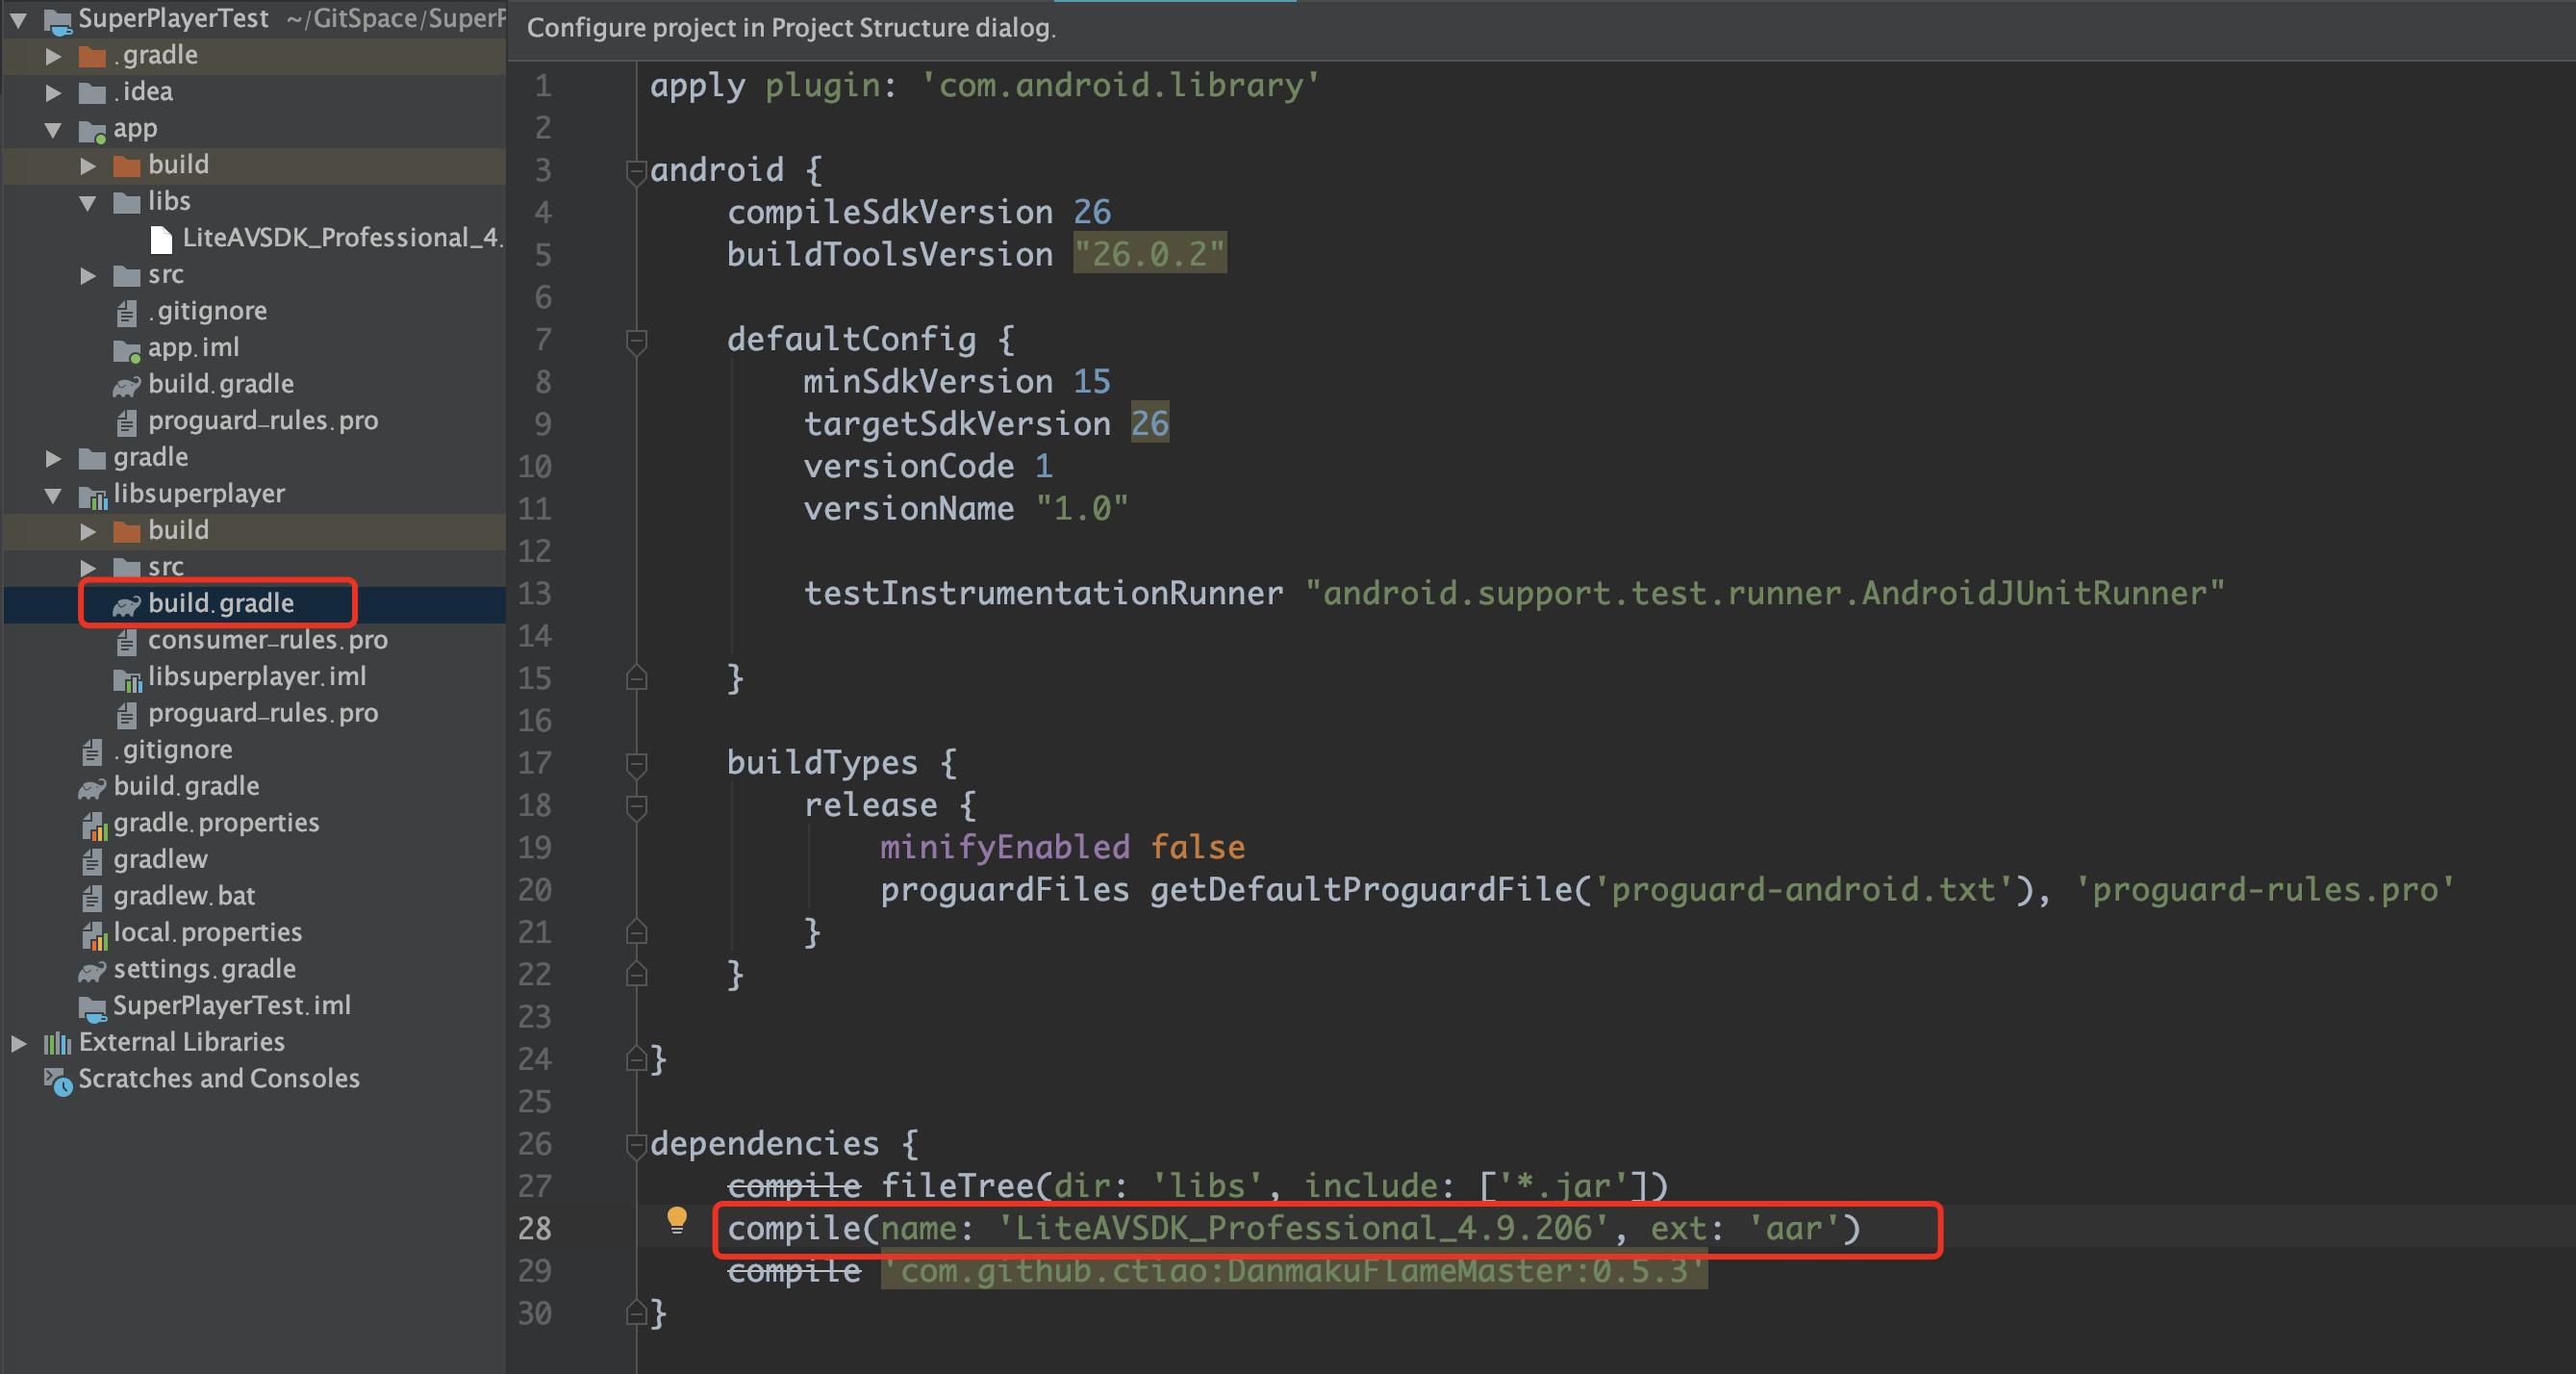 Android lib_tcsuperplayer gralde增加依赖